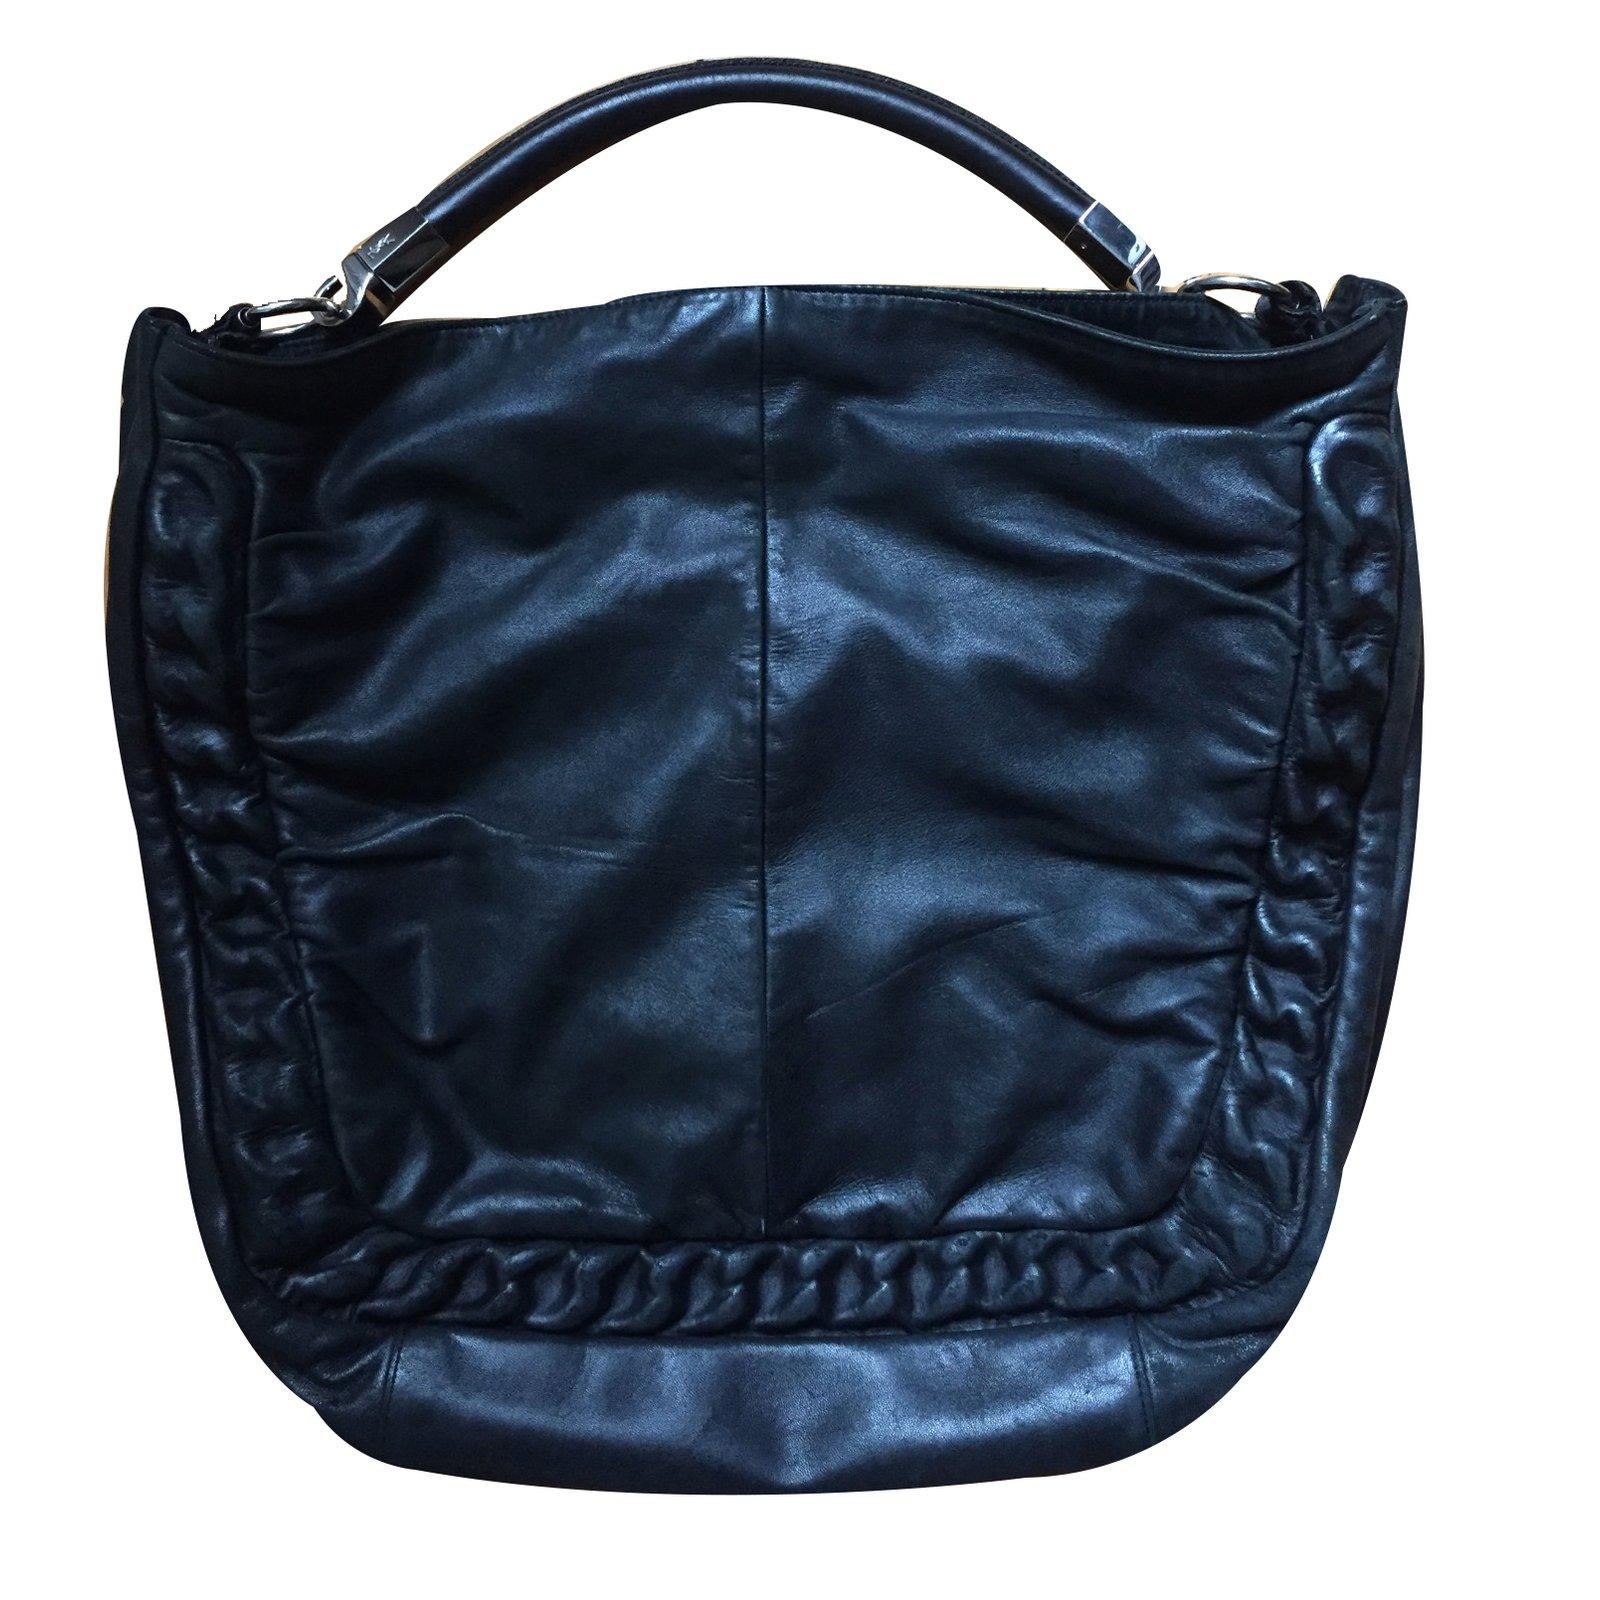 Yves Saint Laurent Handbag Handbags Patent leather Black ref.24281 - Joli  Closet 261853b84f8d9